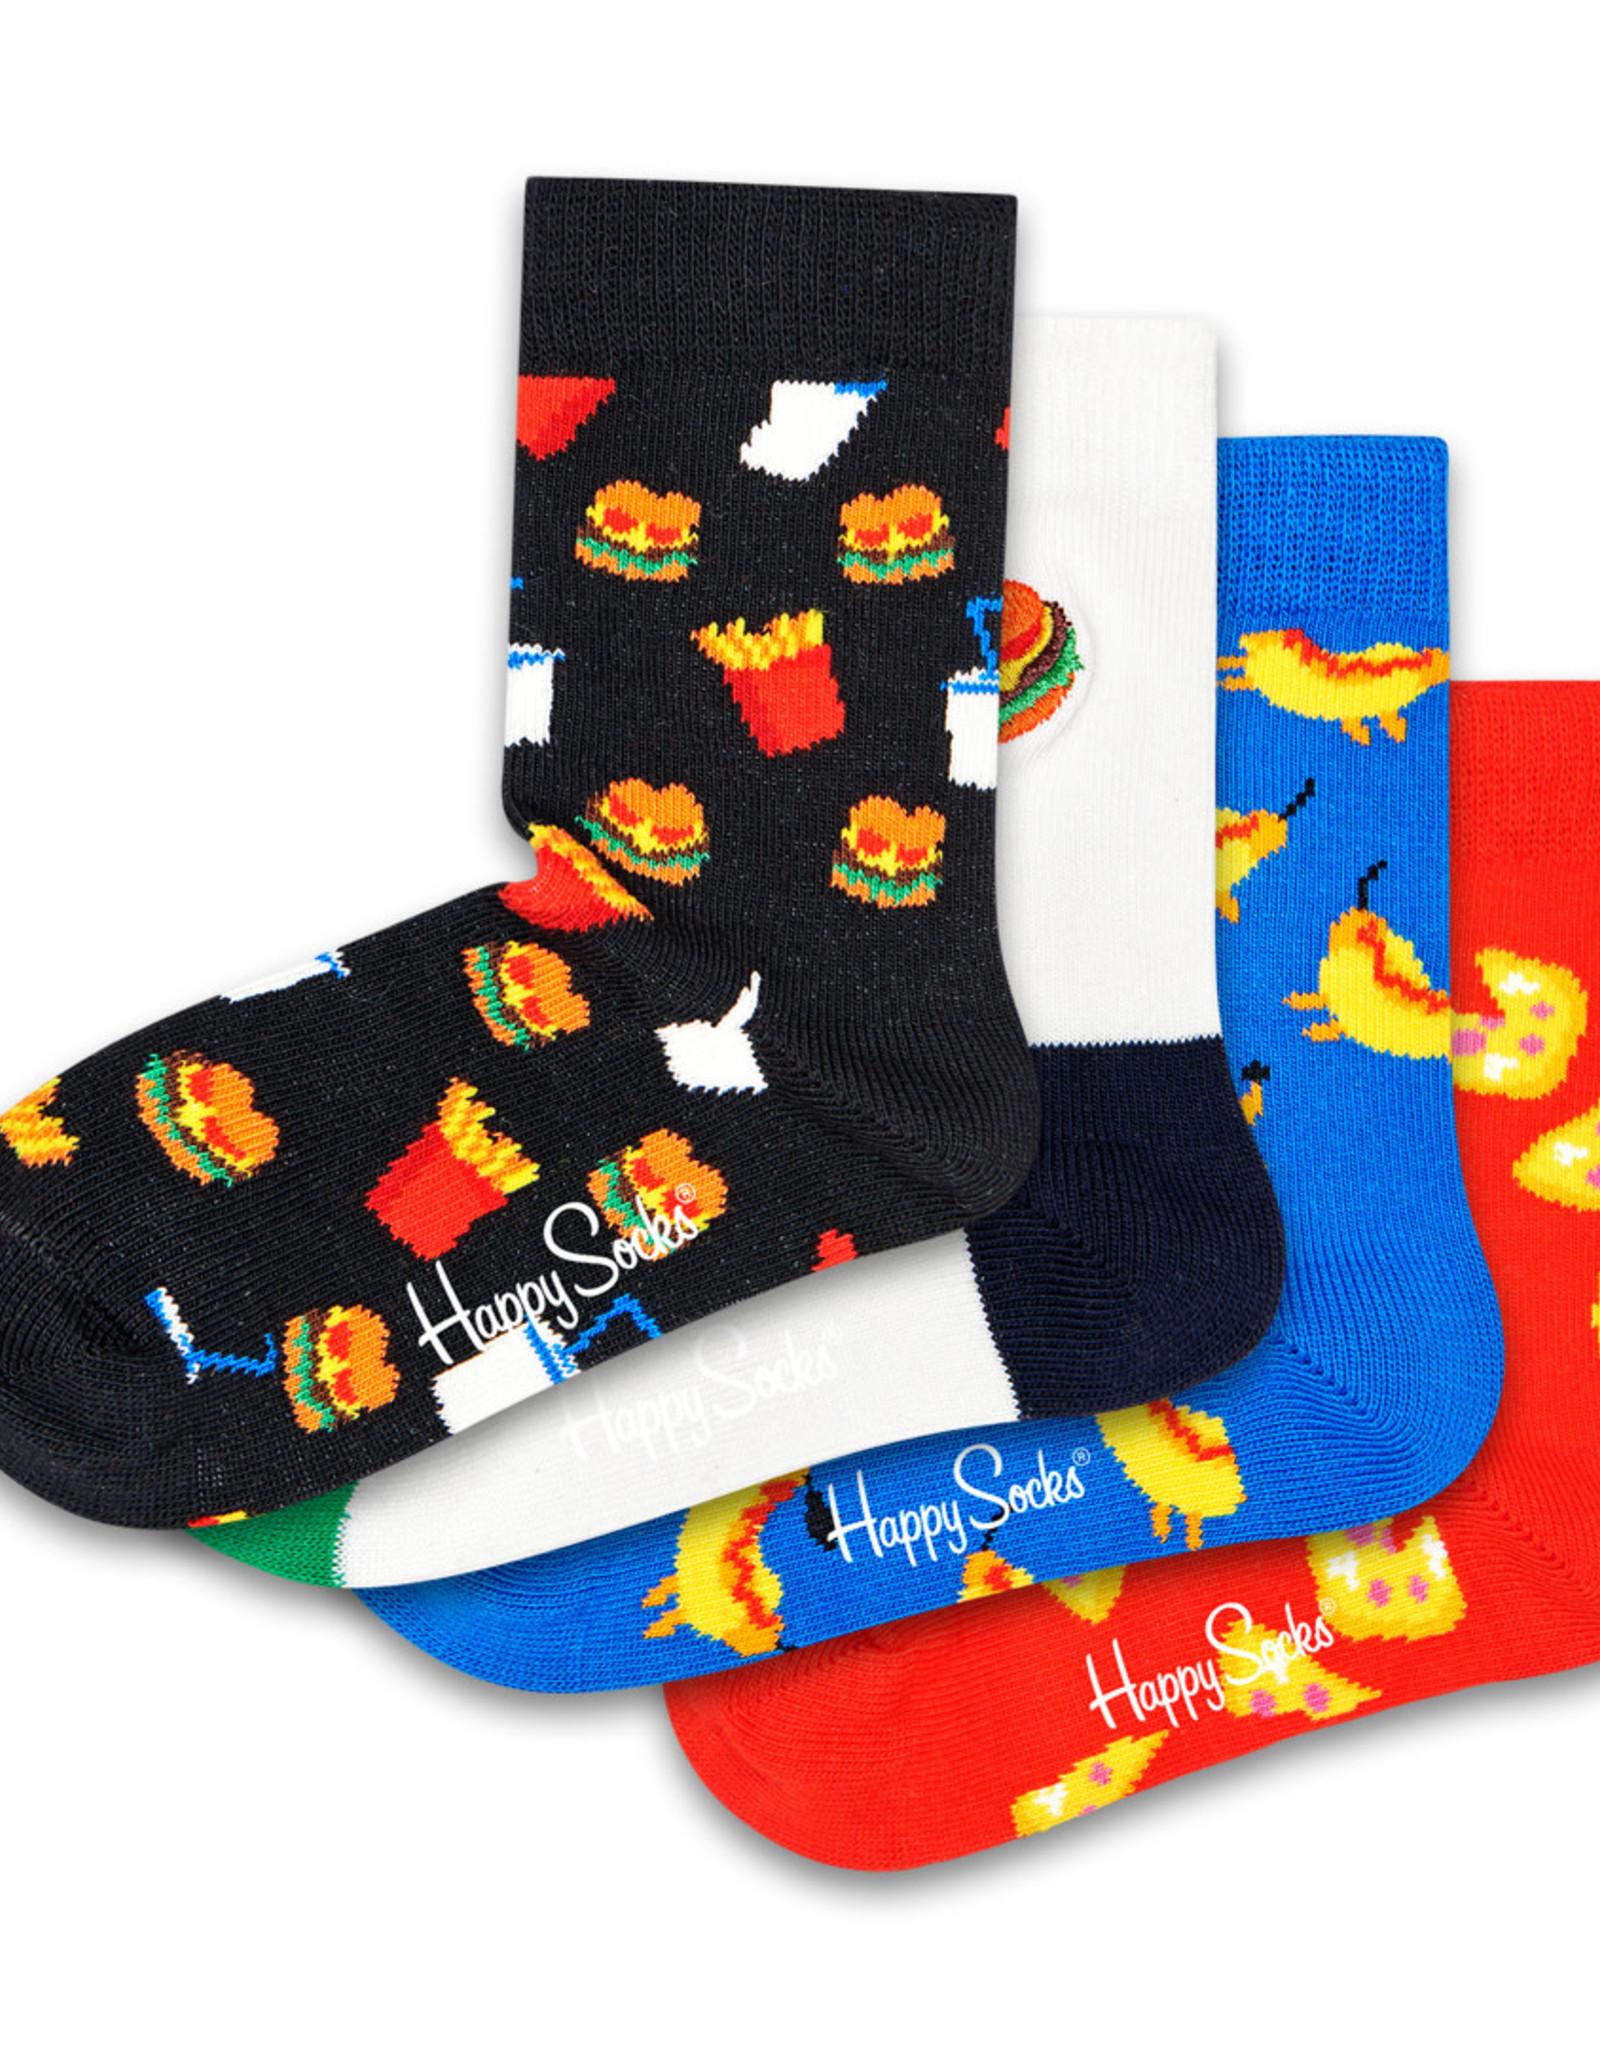 Happy Socks Snack Pack Socks Gift Set